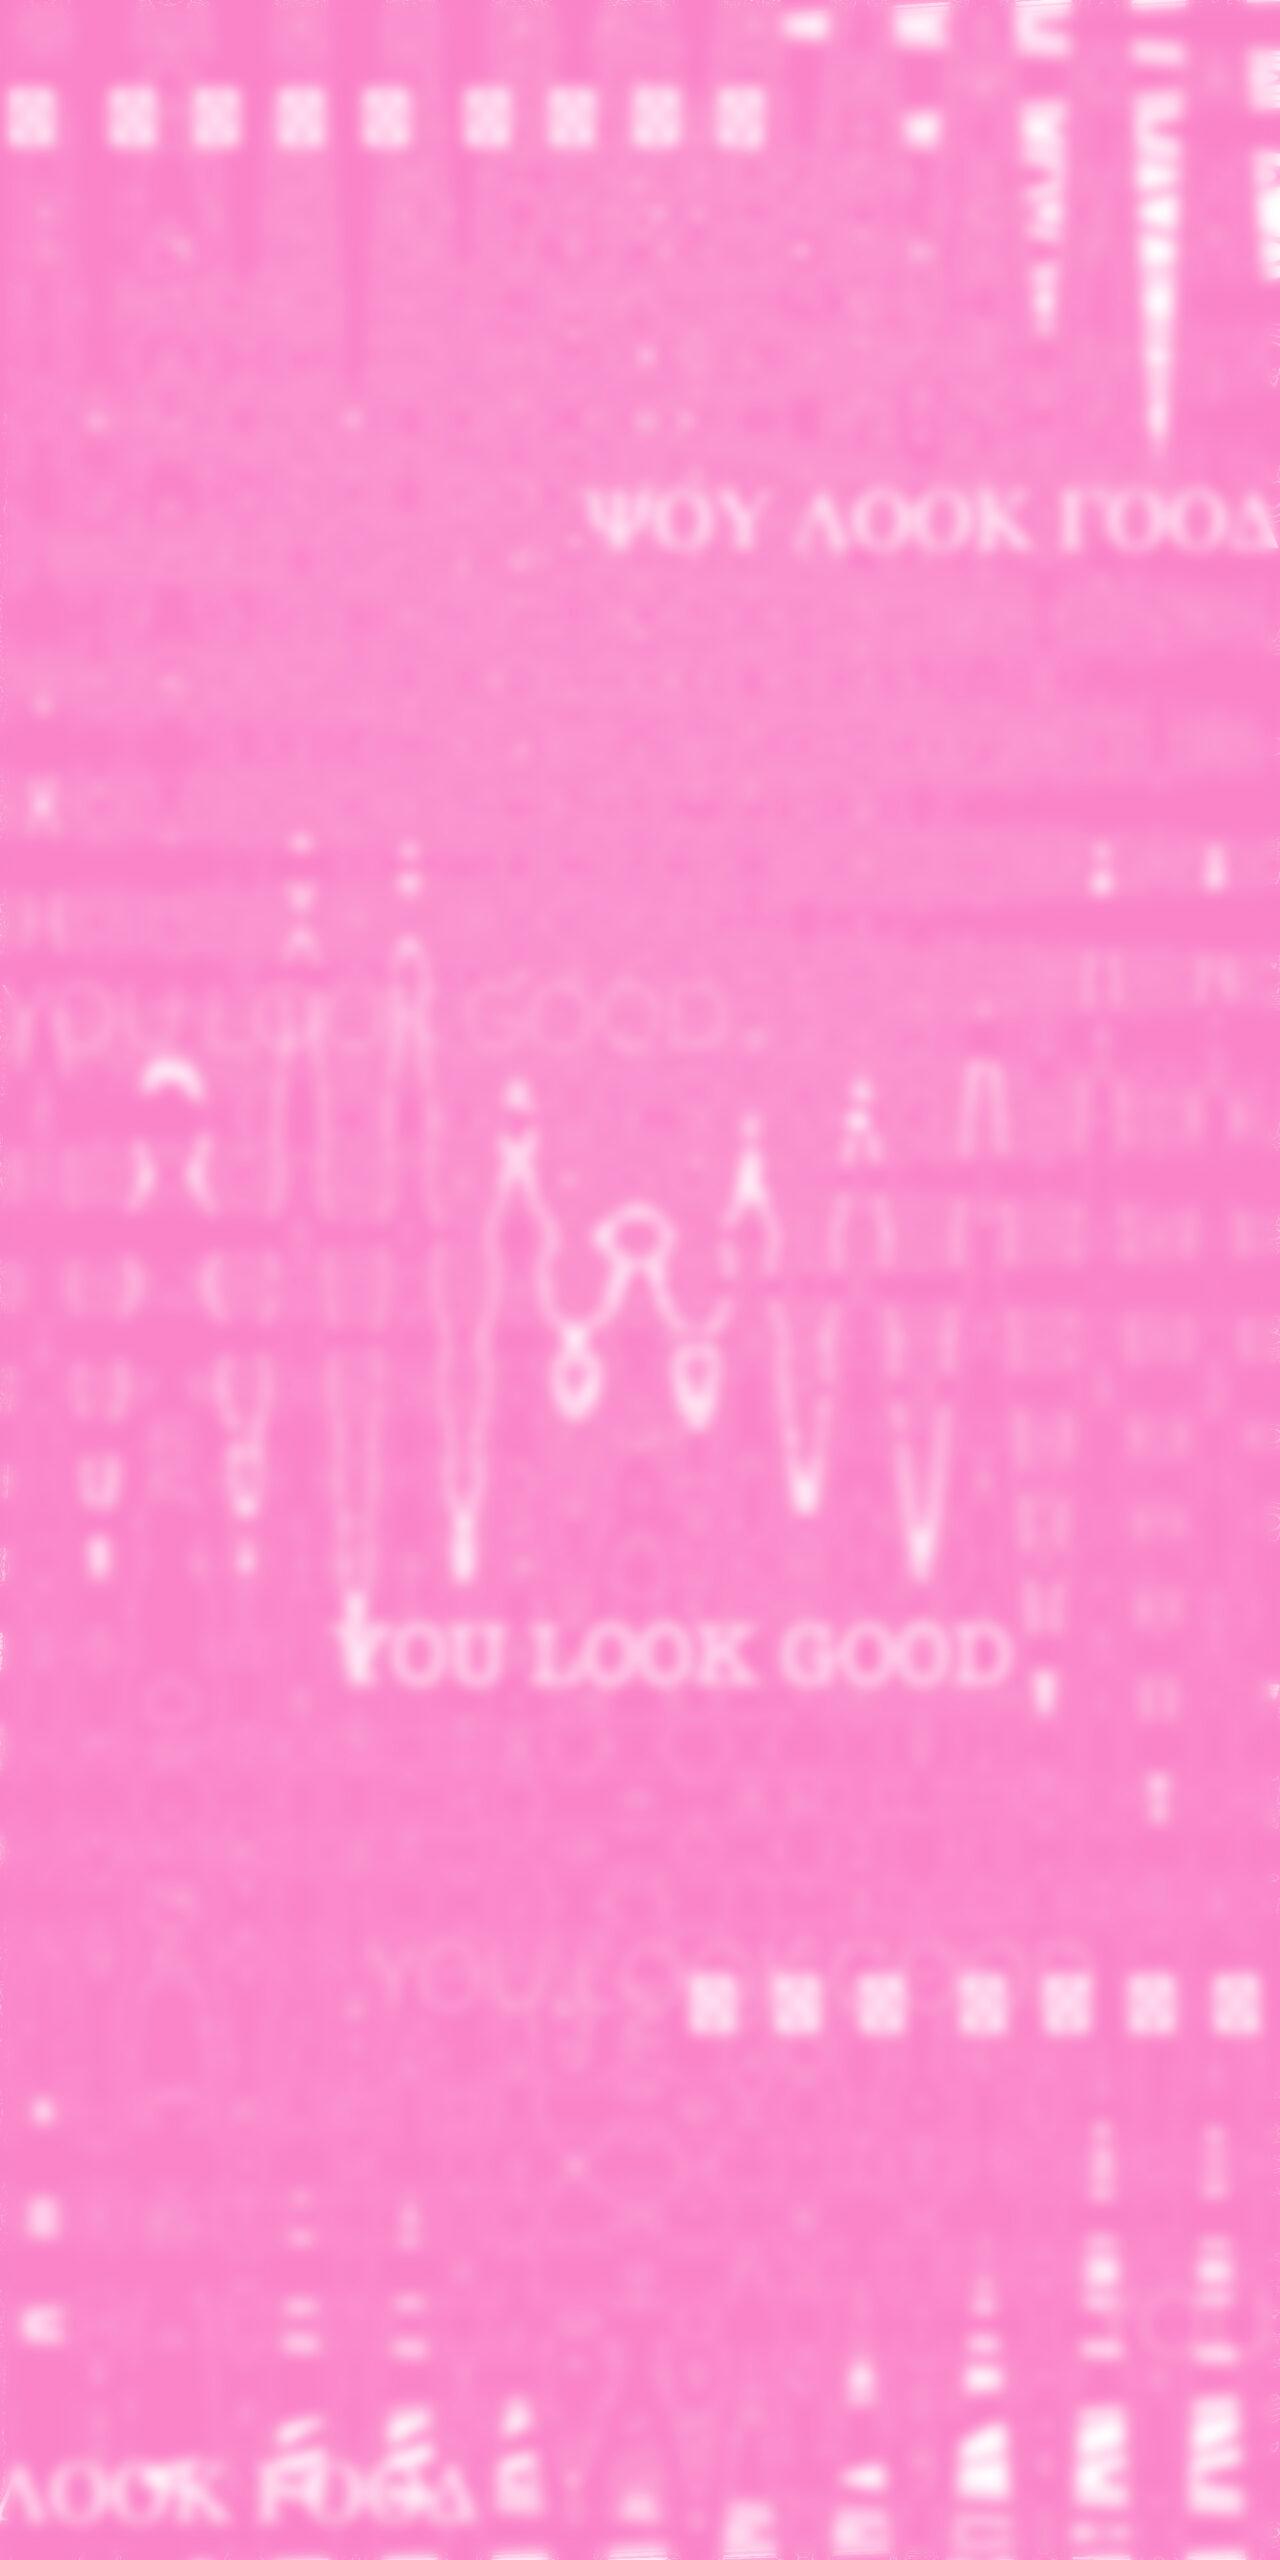 you look good pink blur wallpaper